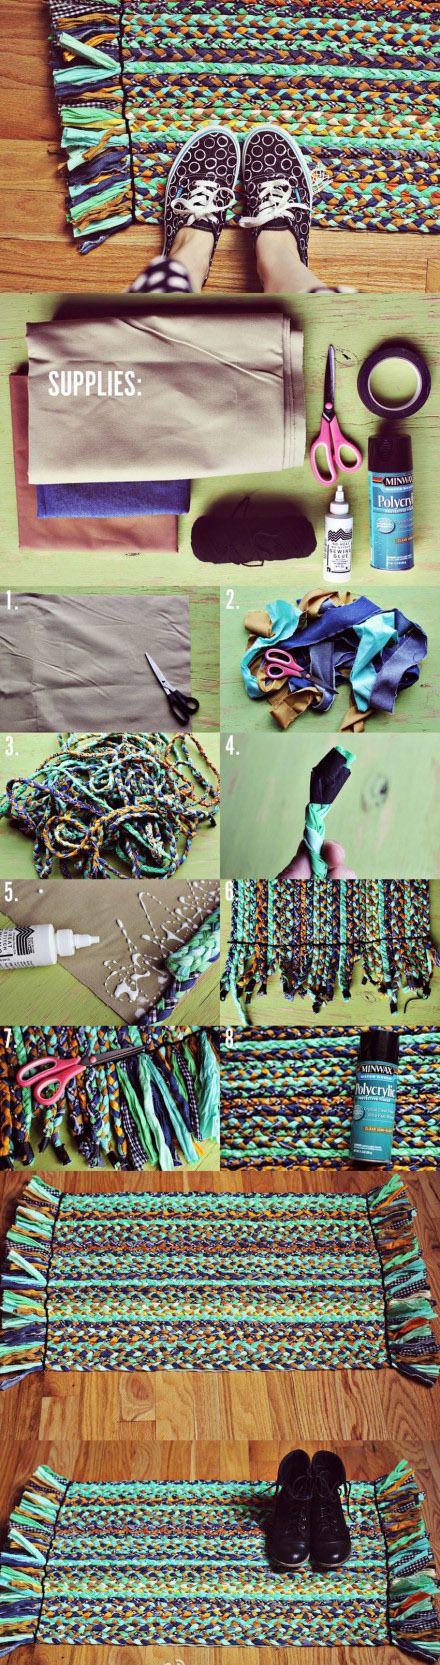 diy rug diy crafts craft ideas easy crafts diy ideas diy On diy home decor rug